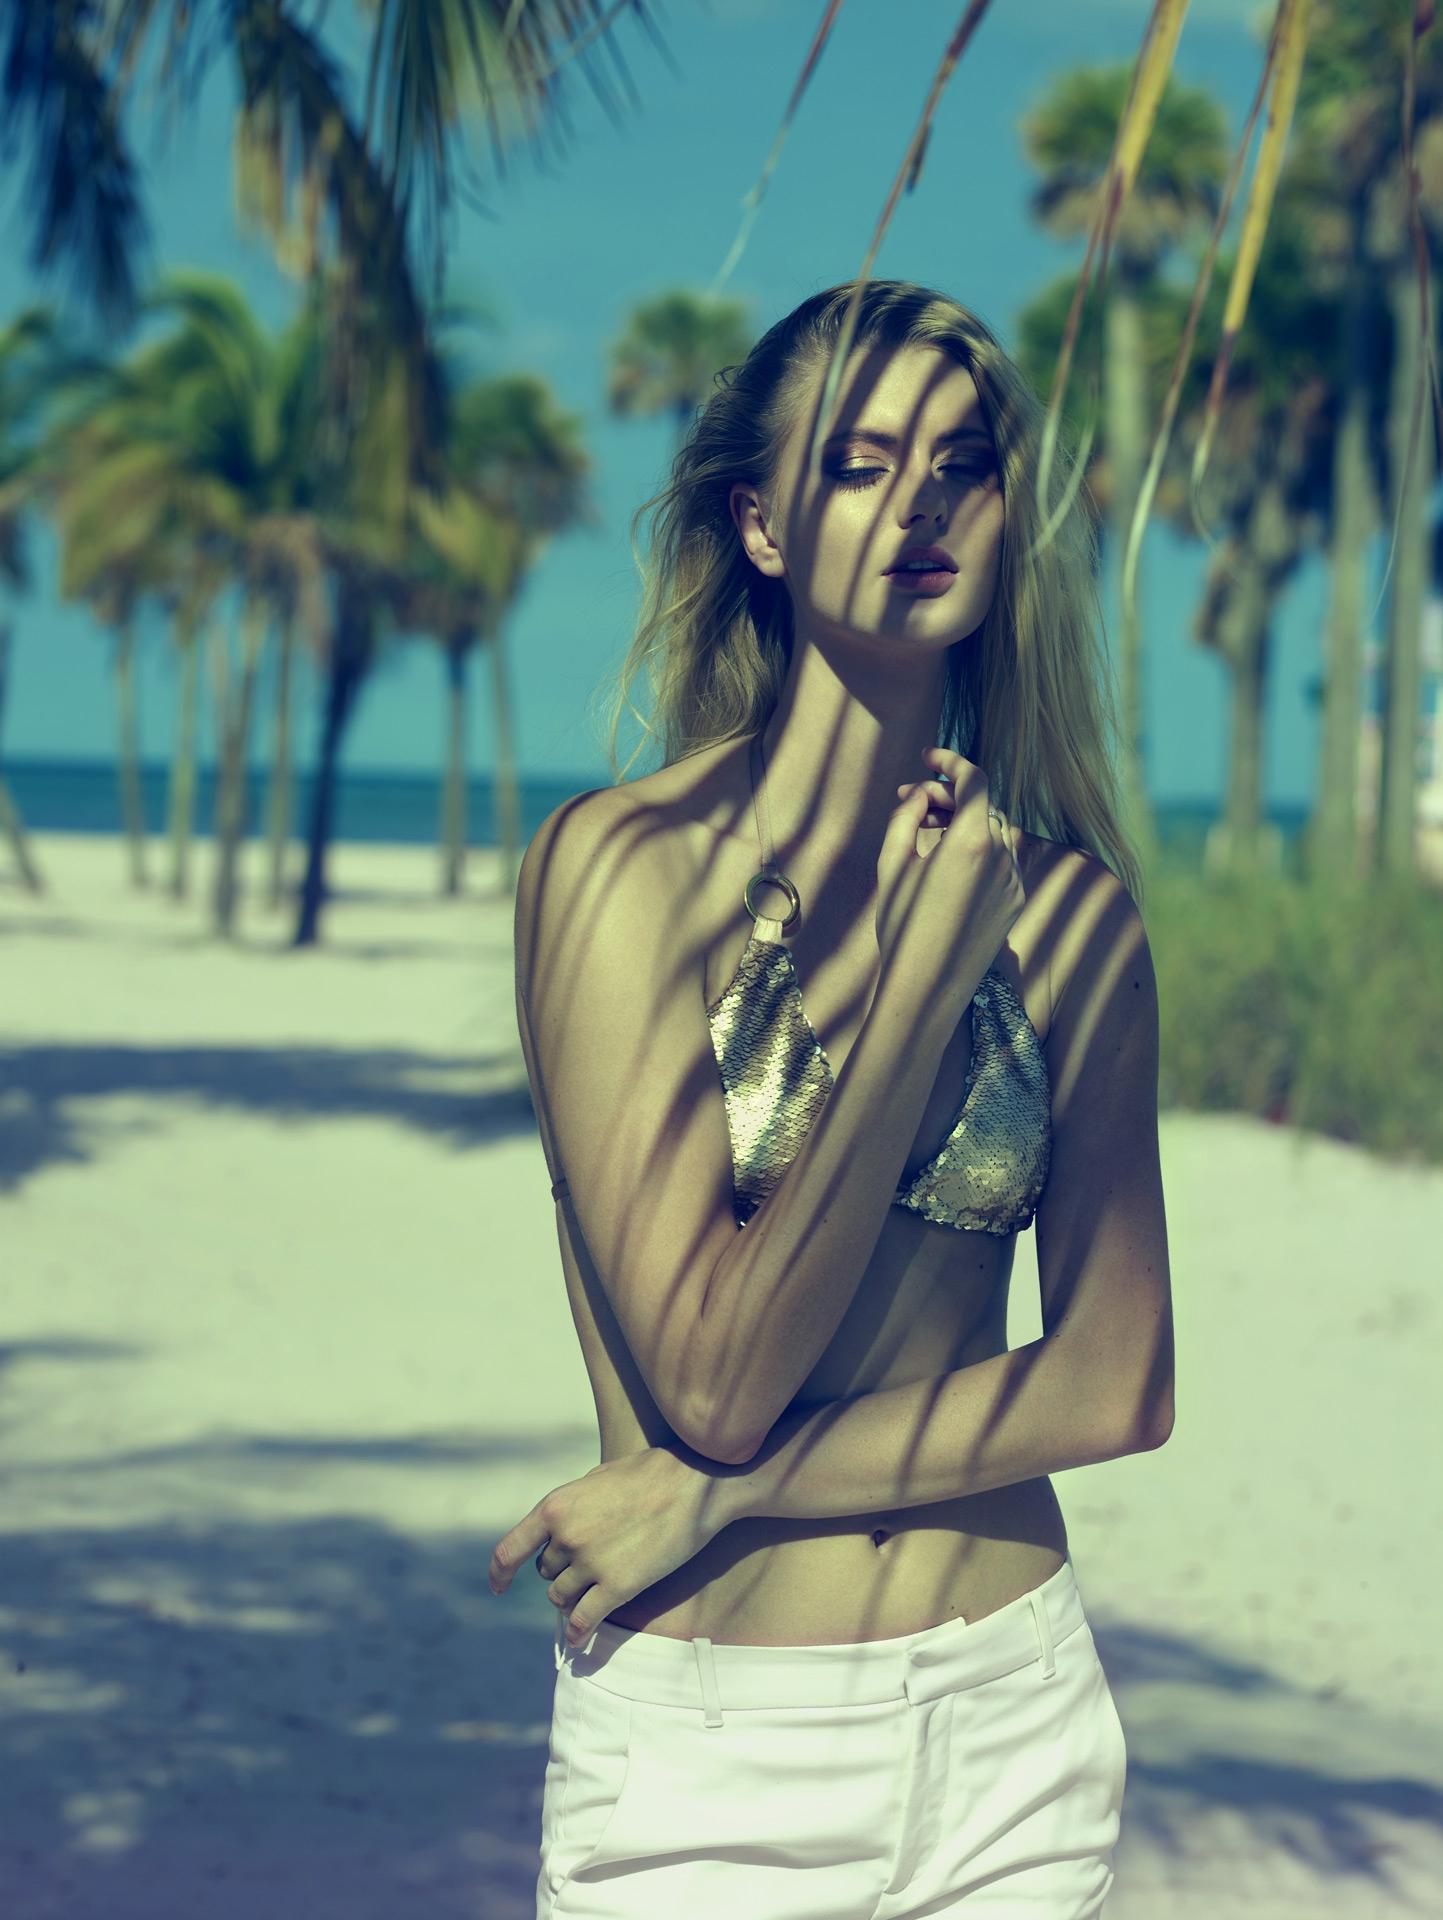 beach bunny siren song swimwear underwear miami beach palm tree lifestyle editorial frederic mercier fashion photographer one color